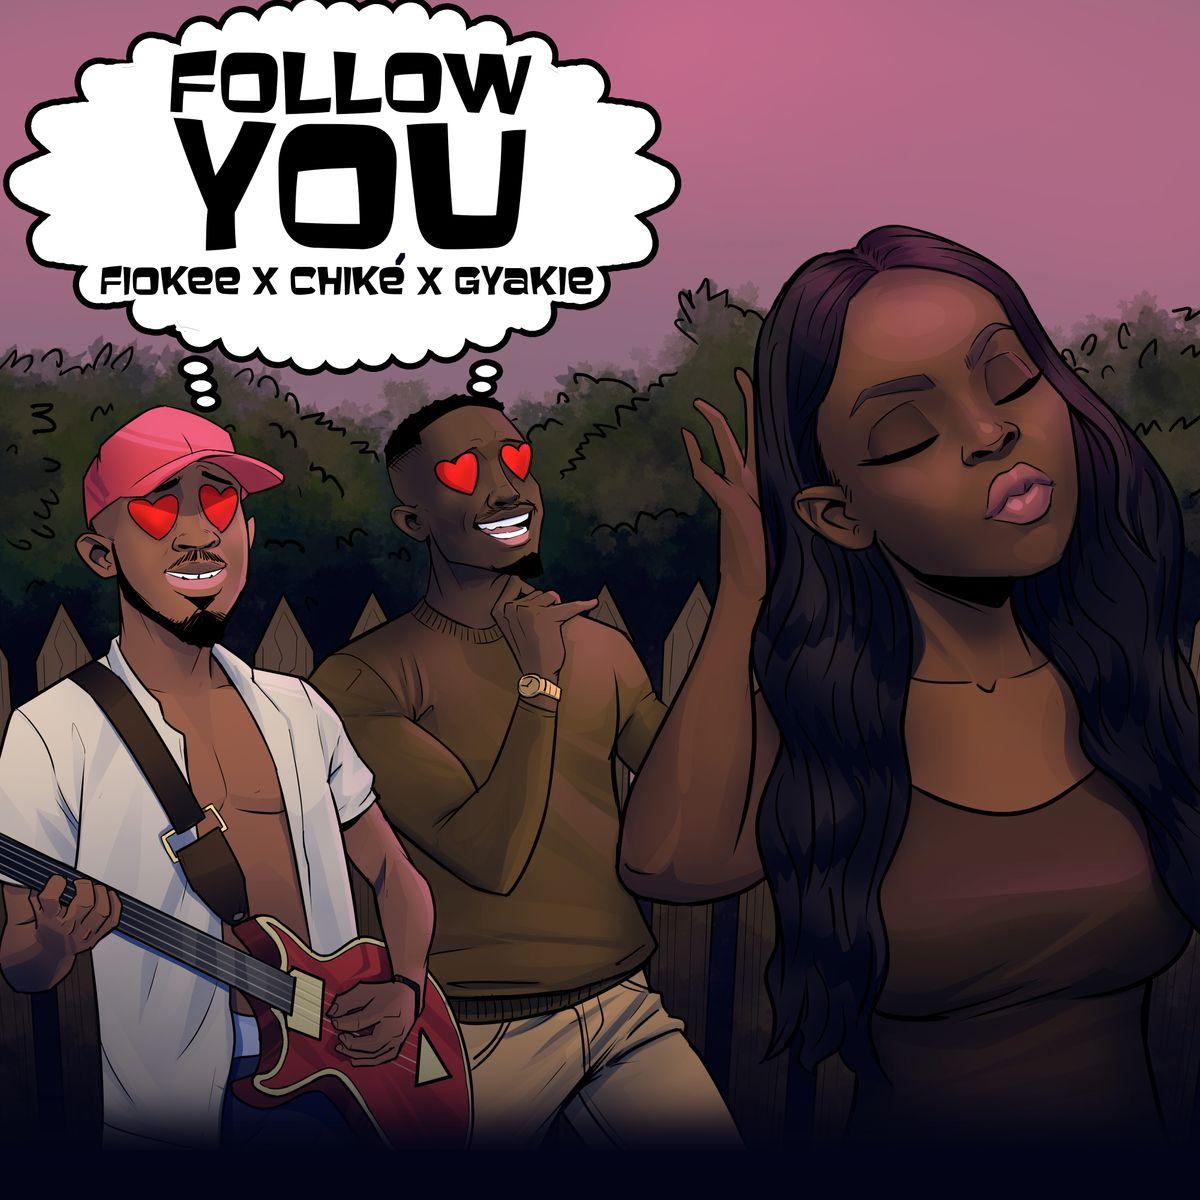 Fiokee ft. Chike & Gyakie - Follow You